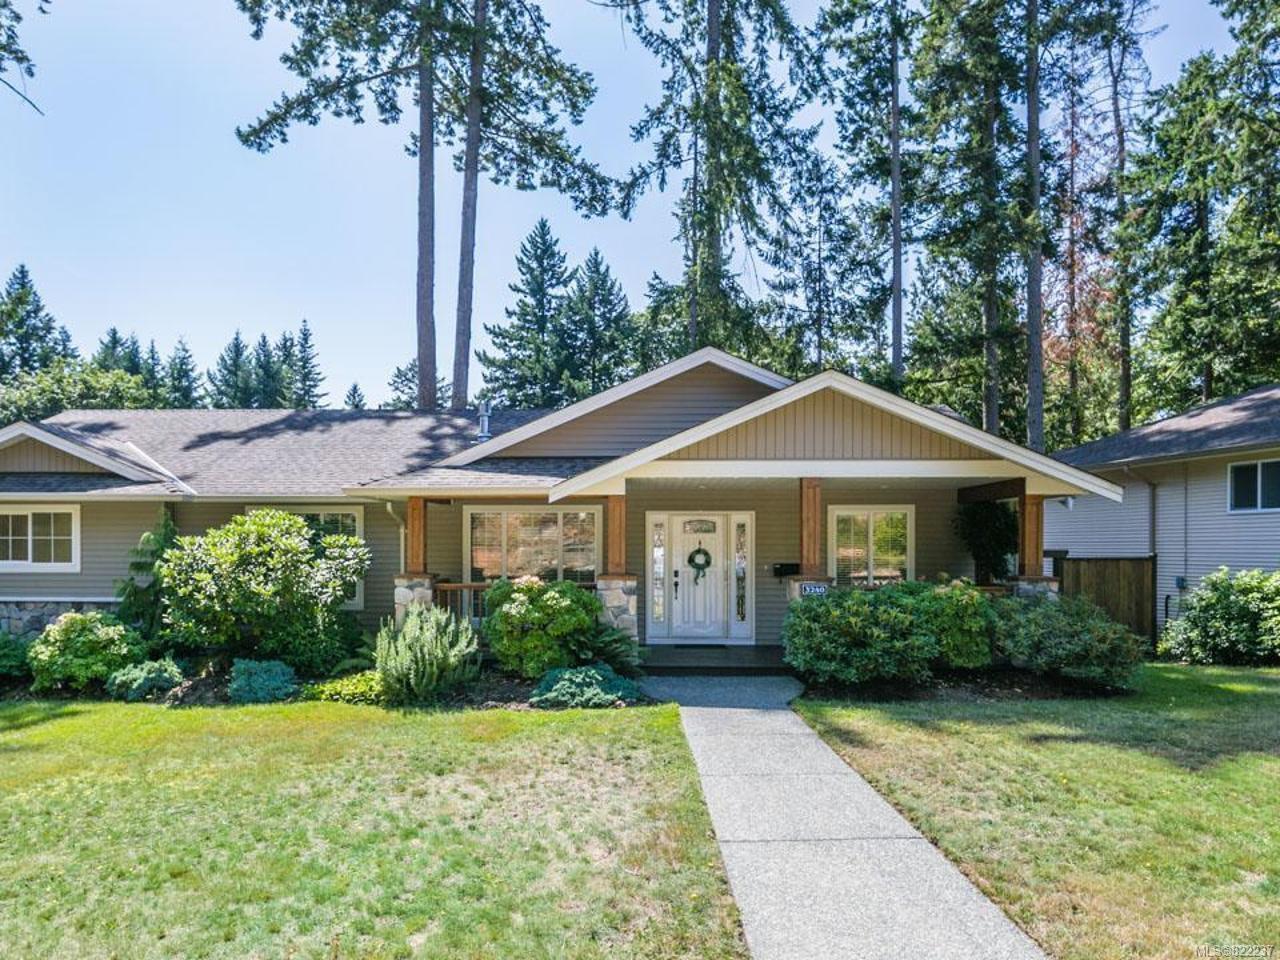 Main Photo: 3240 Granite Park Rd in NANAIMO: Na Departure Bay House for sale (Nanaimo)  : MLS®# 822237